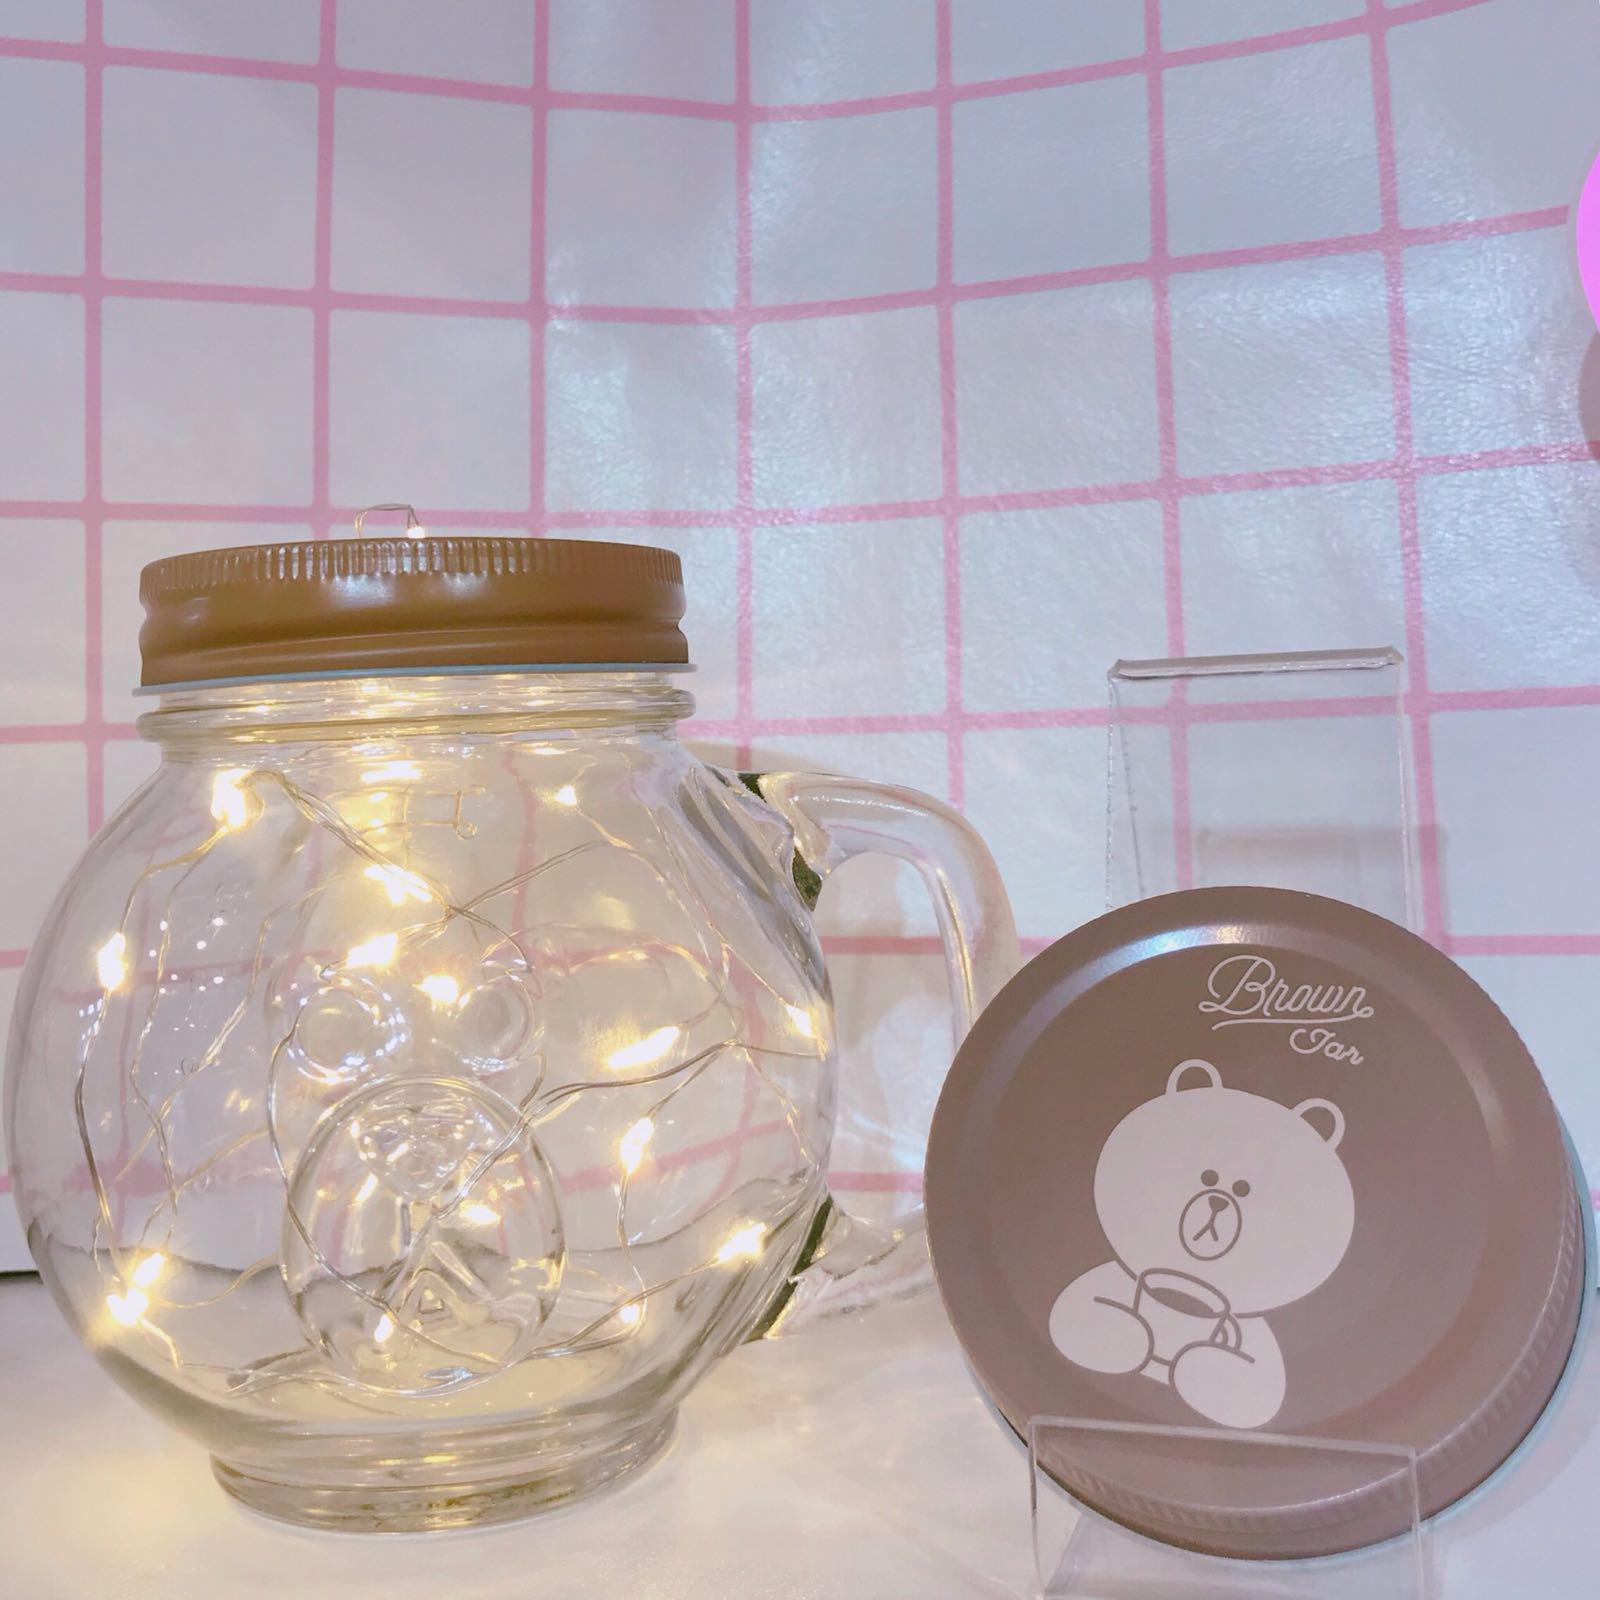 Line熊大玻璃杯 Glass Jar